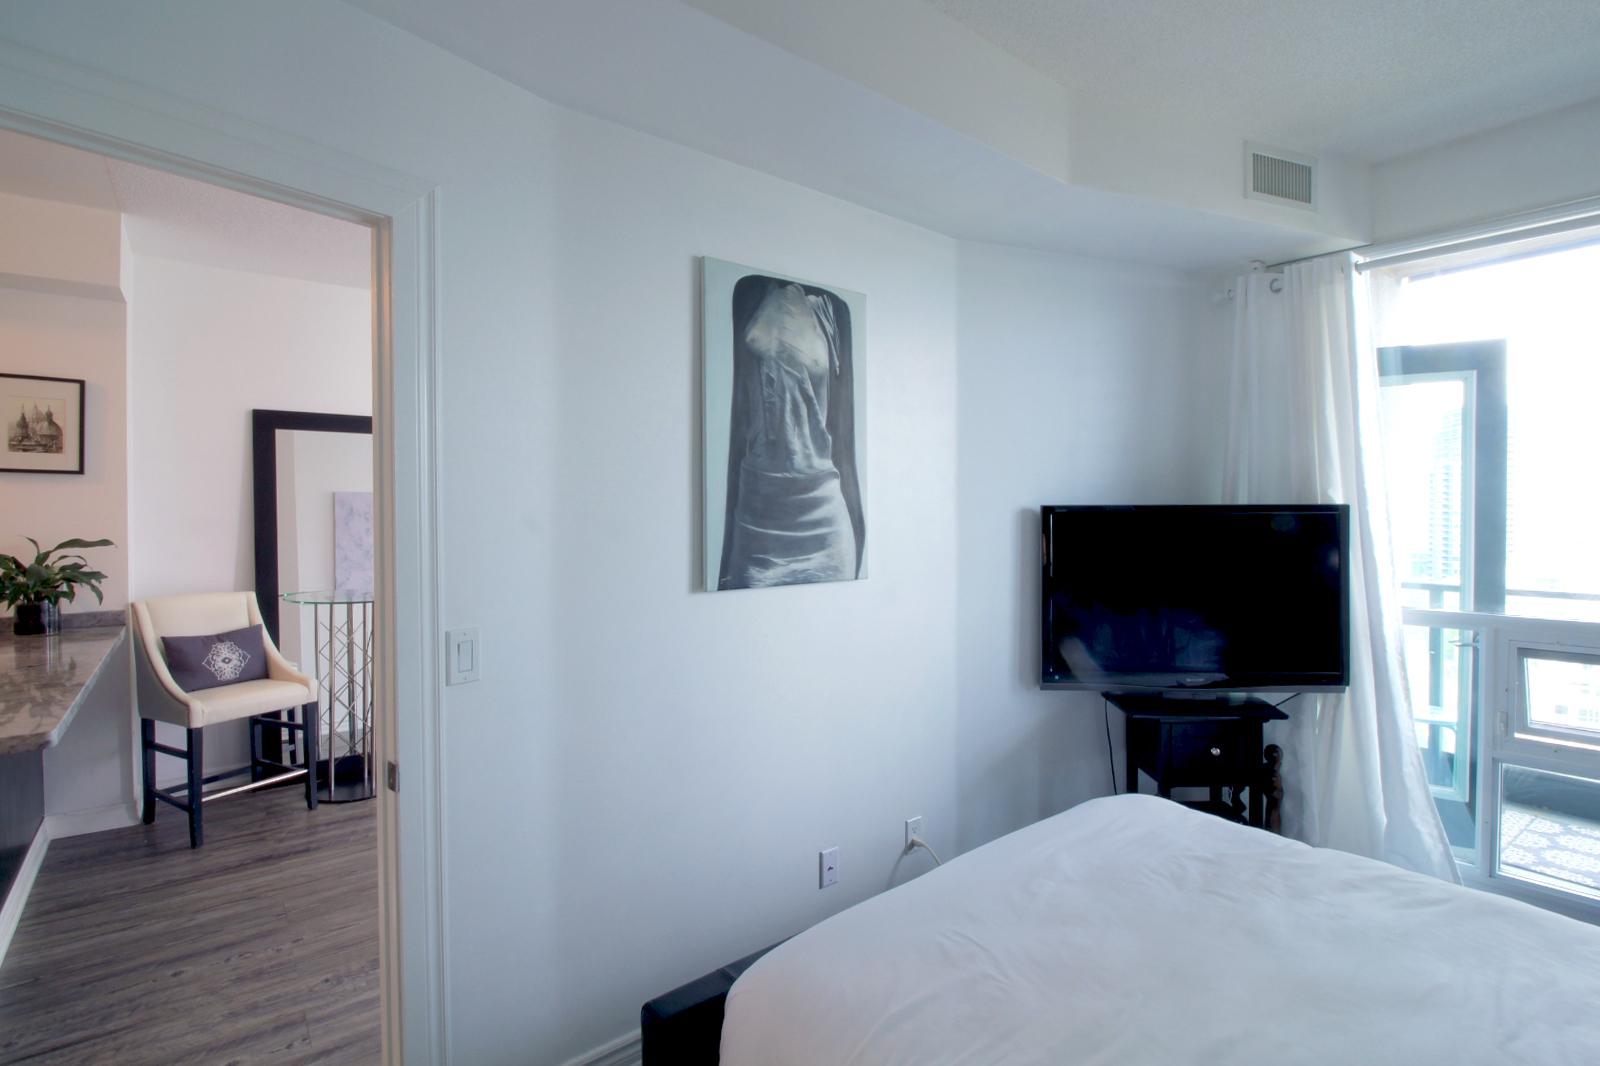 04 - Bedroom 1.jpg